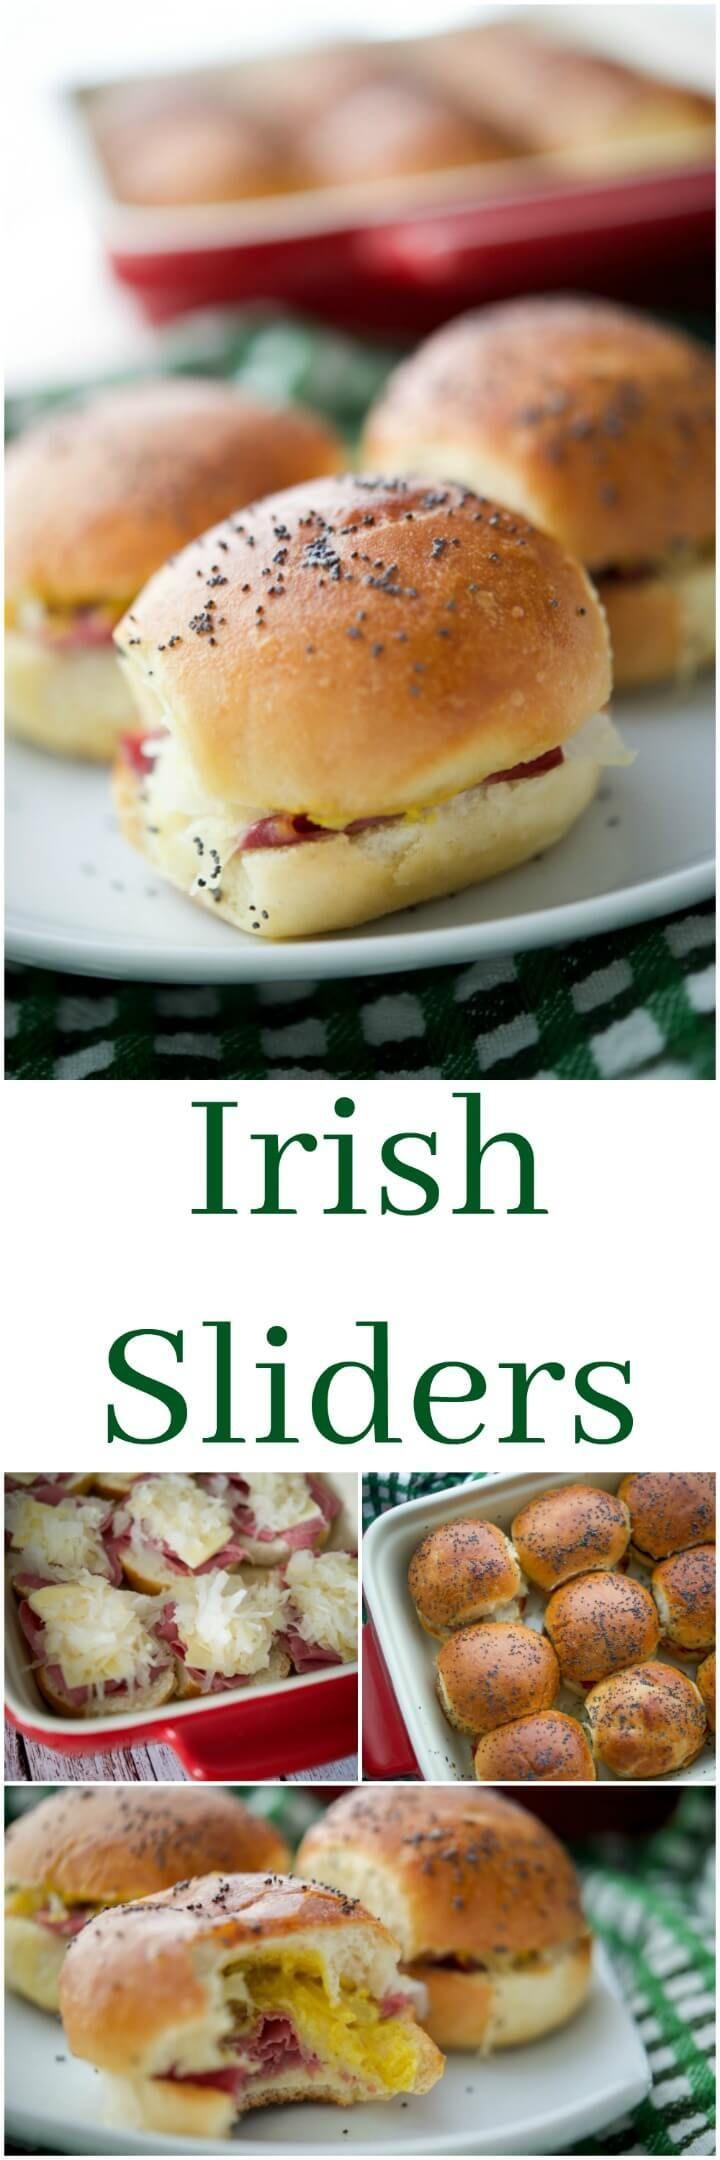 Cheesy Irish Sliders via @ohsweetbasil